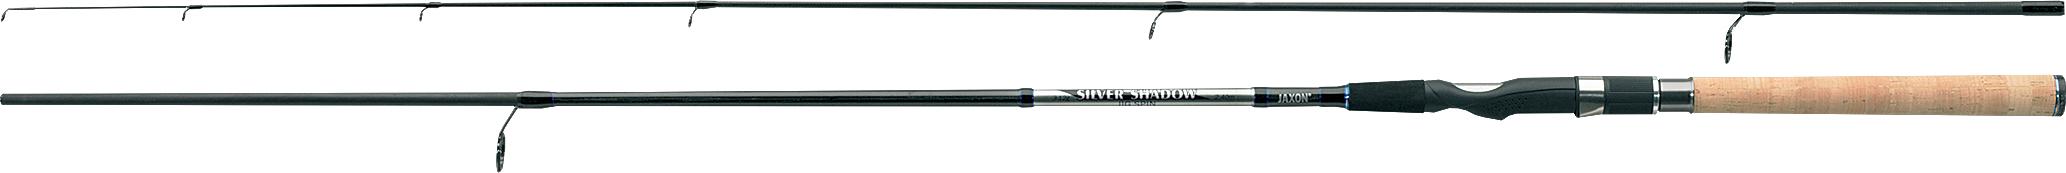 Jaxon Prut Silver Shadow Jig Spin 2,1m 1-9g